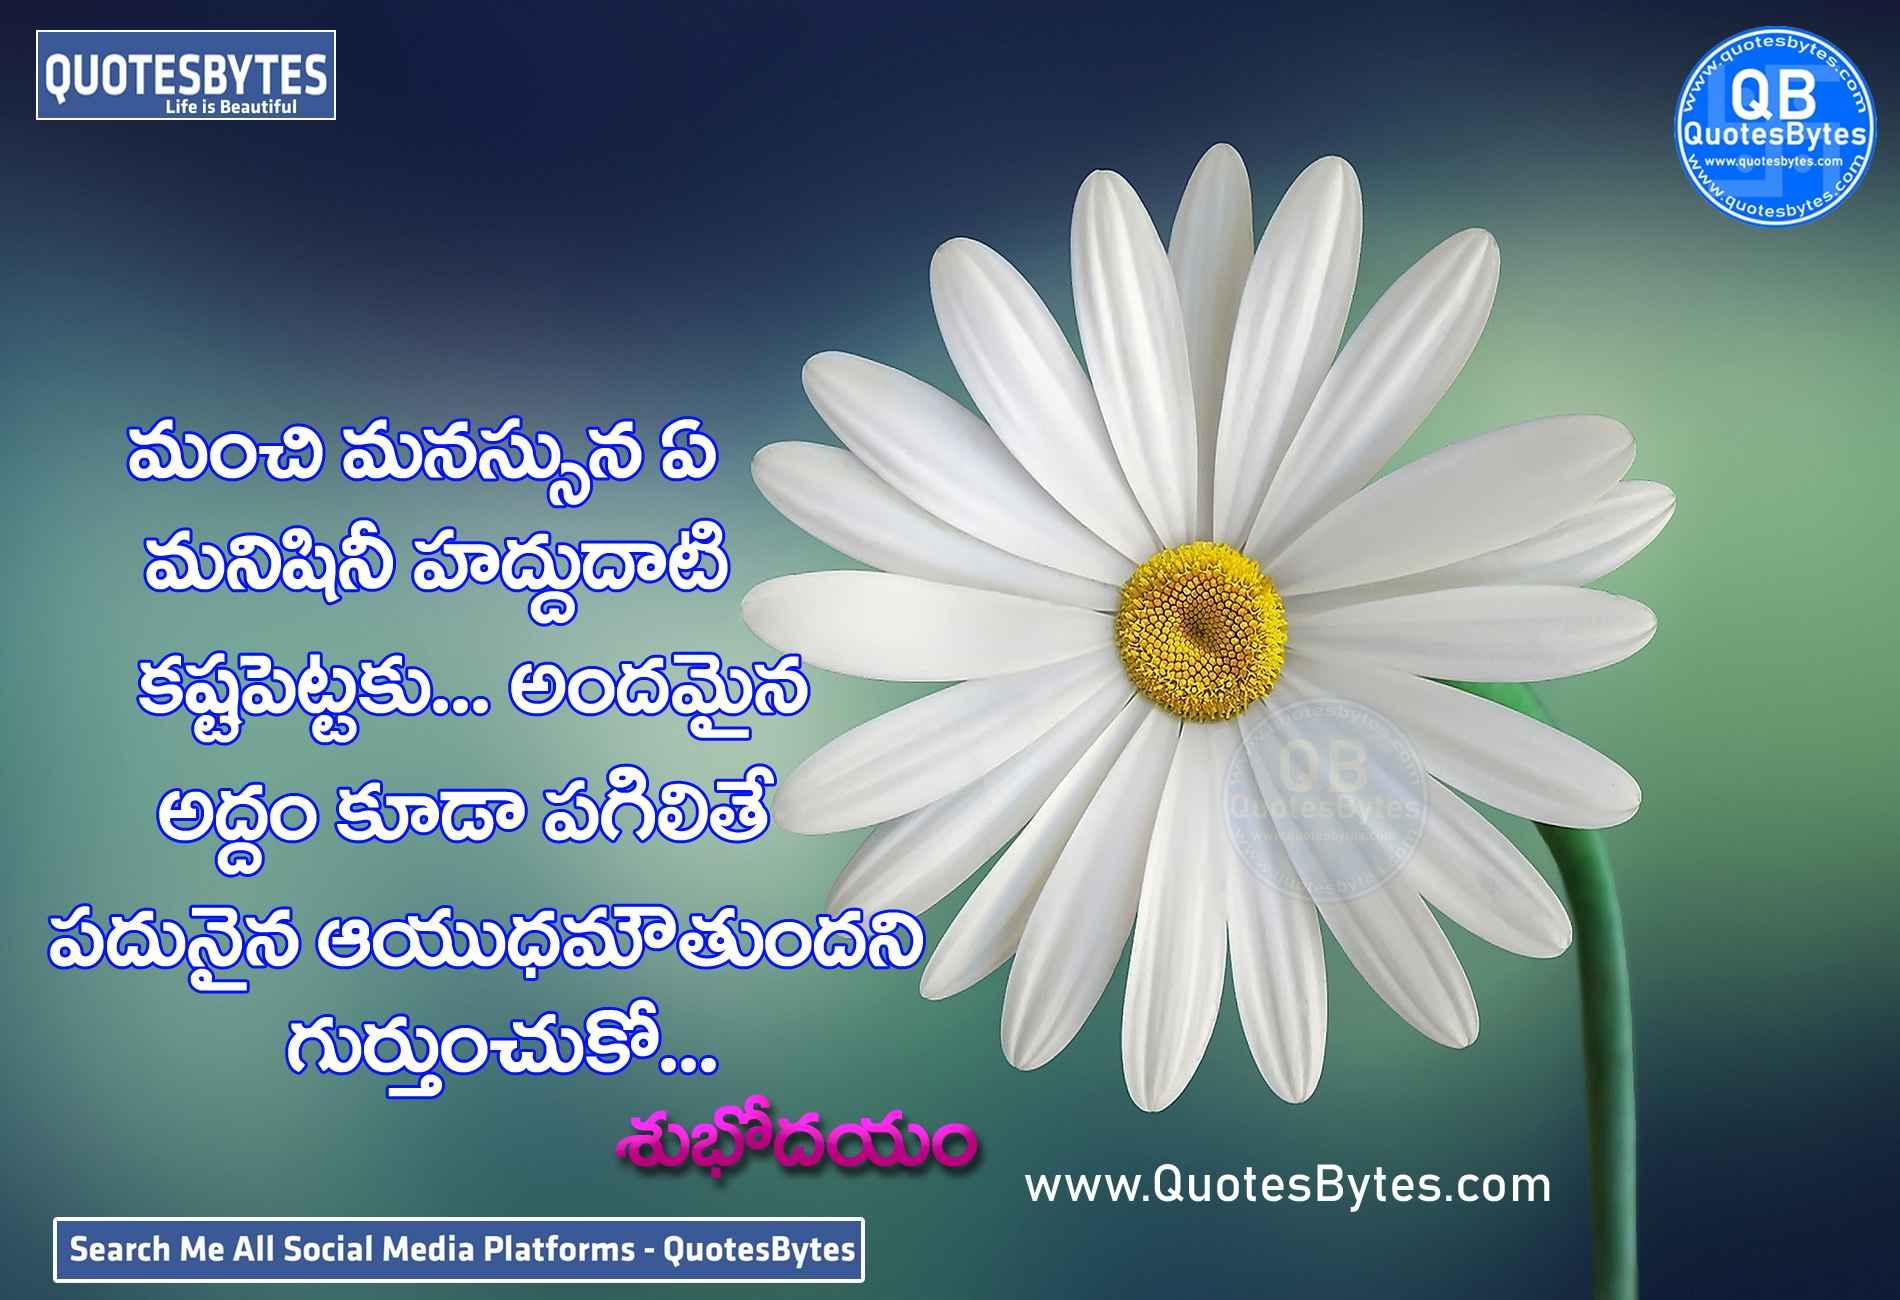 good morning images in telugu-Good Morning Quotes in Telugu